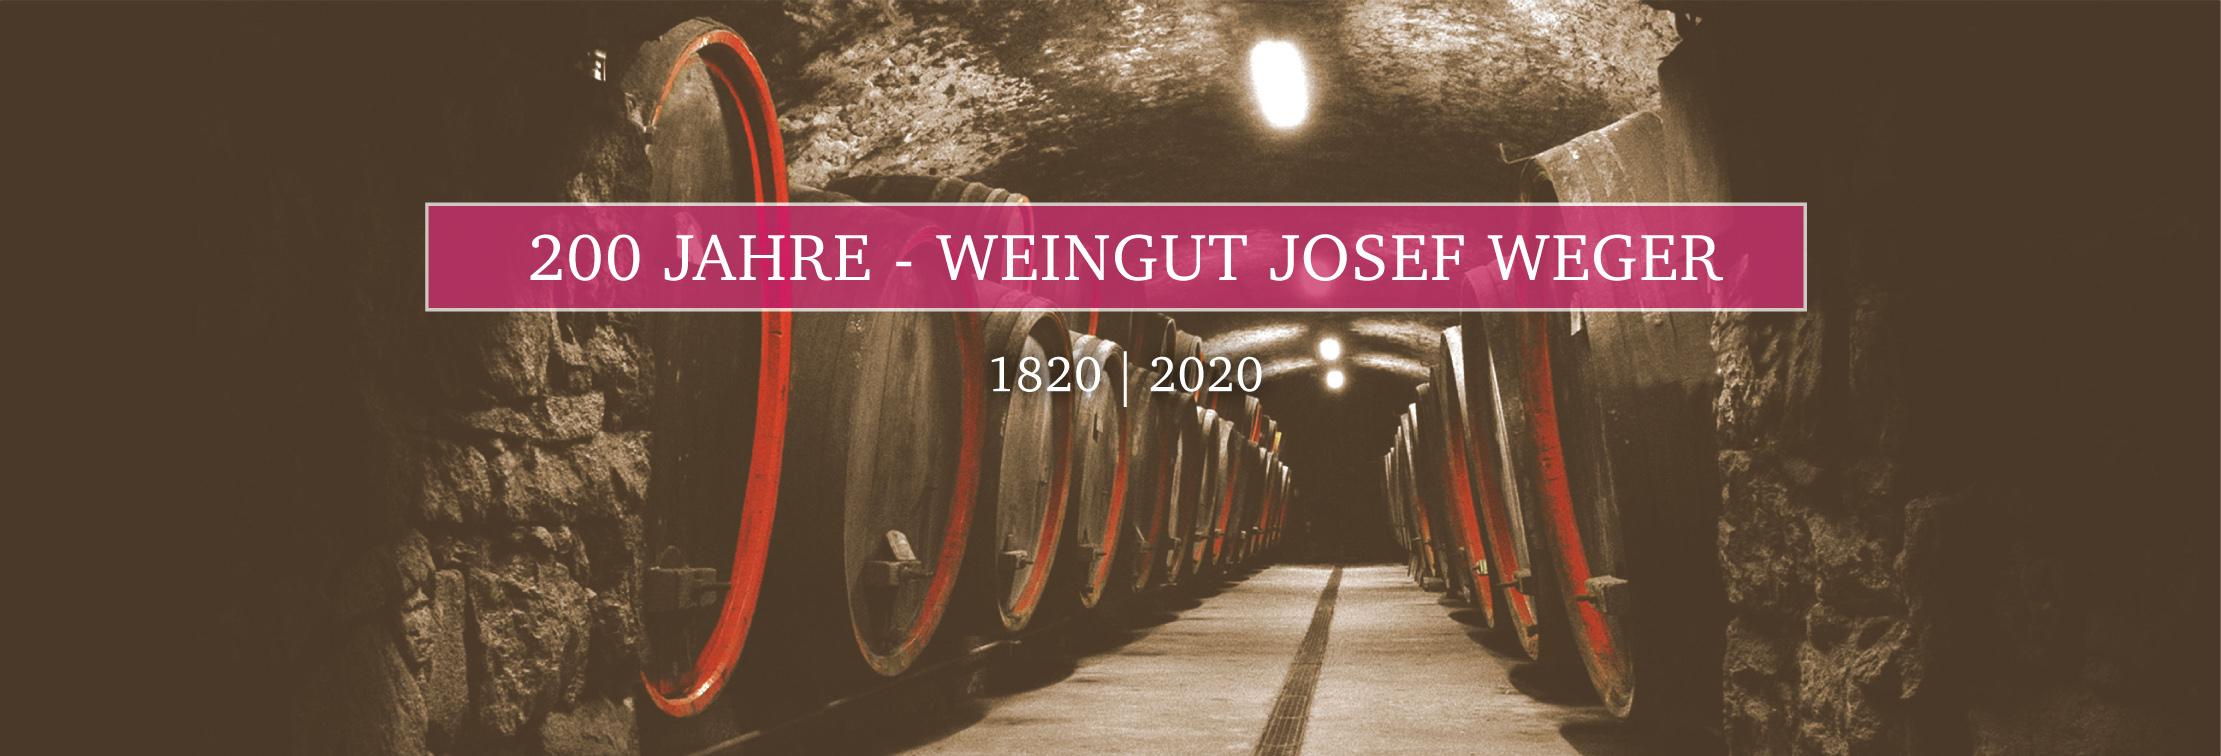 200 Jahre Weingut Josef Weger Girlan Keller